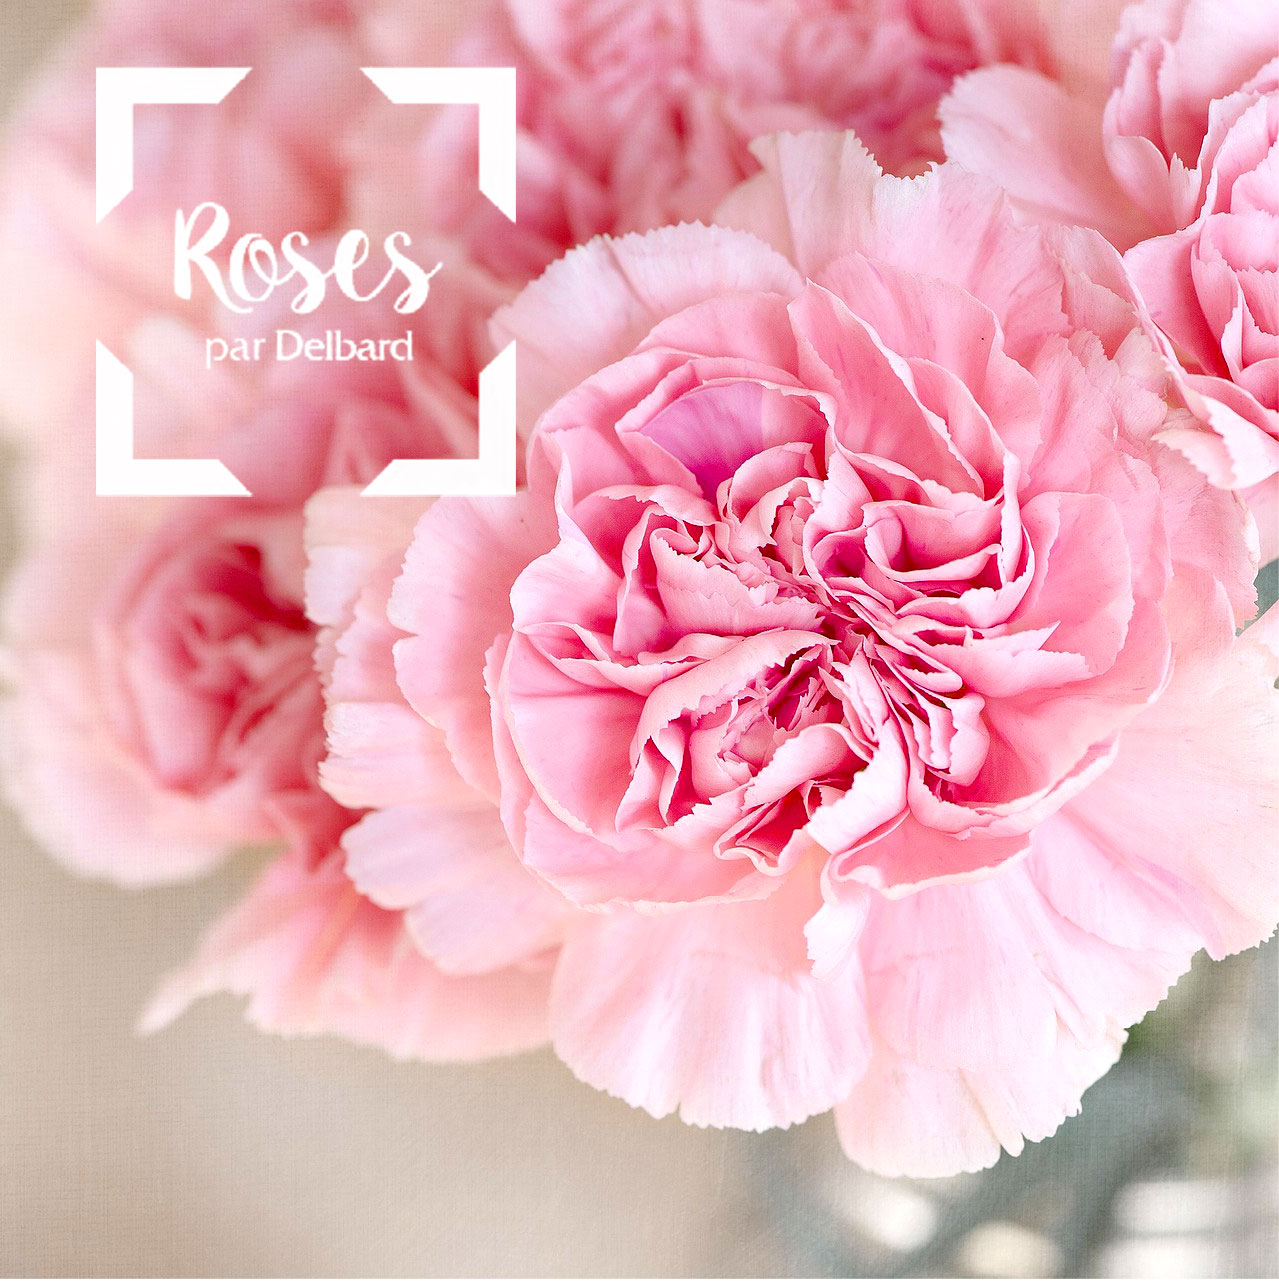 blog-jardin-delbard-roses-rosiers-conseils